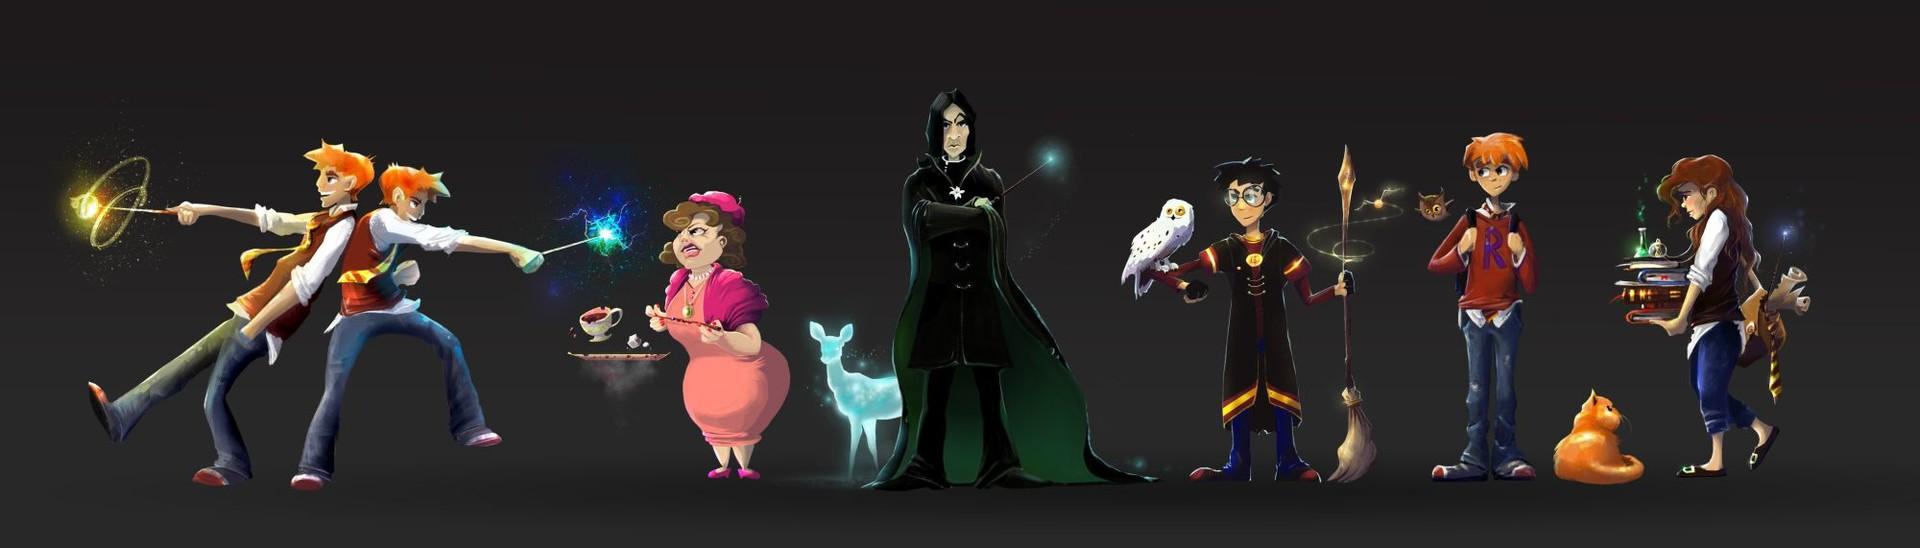 Character Design Challenge Harry Potter : Artstation harry potter character design challenge